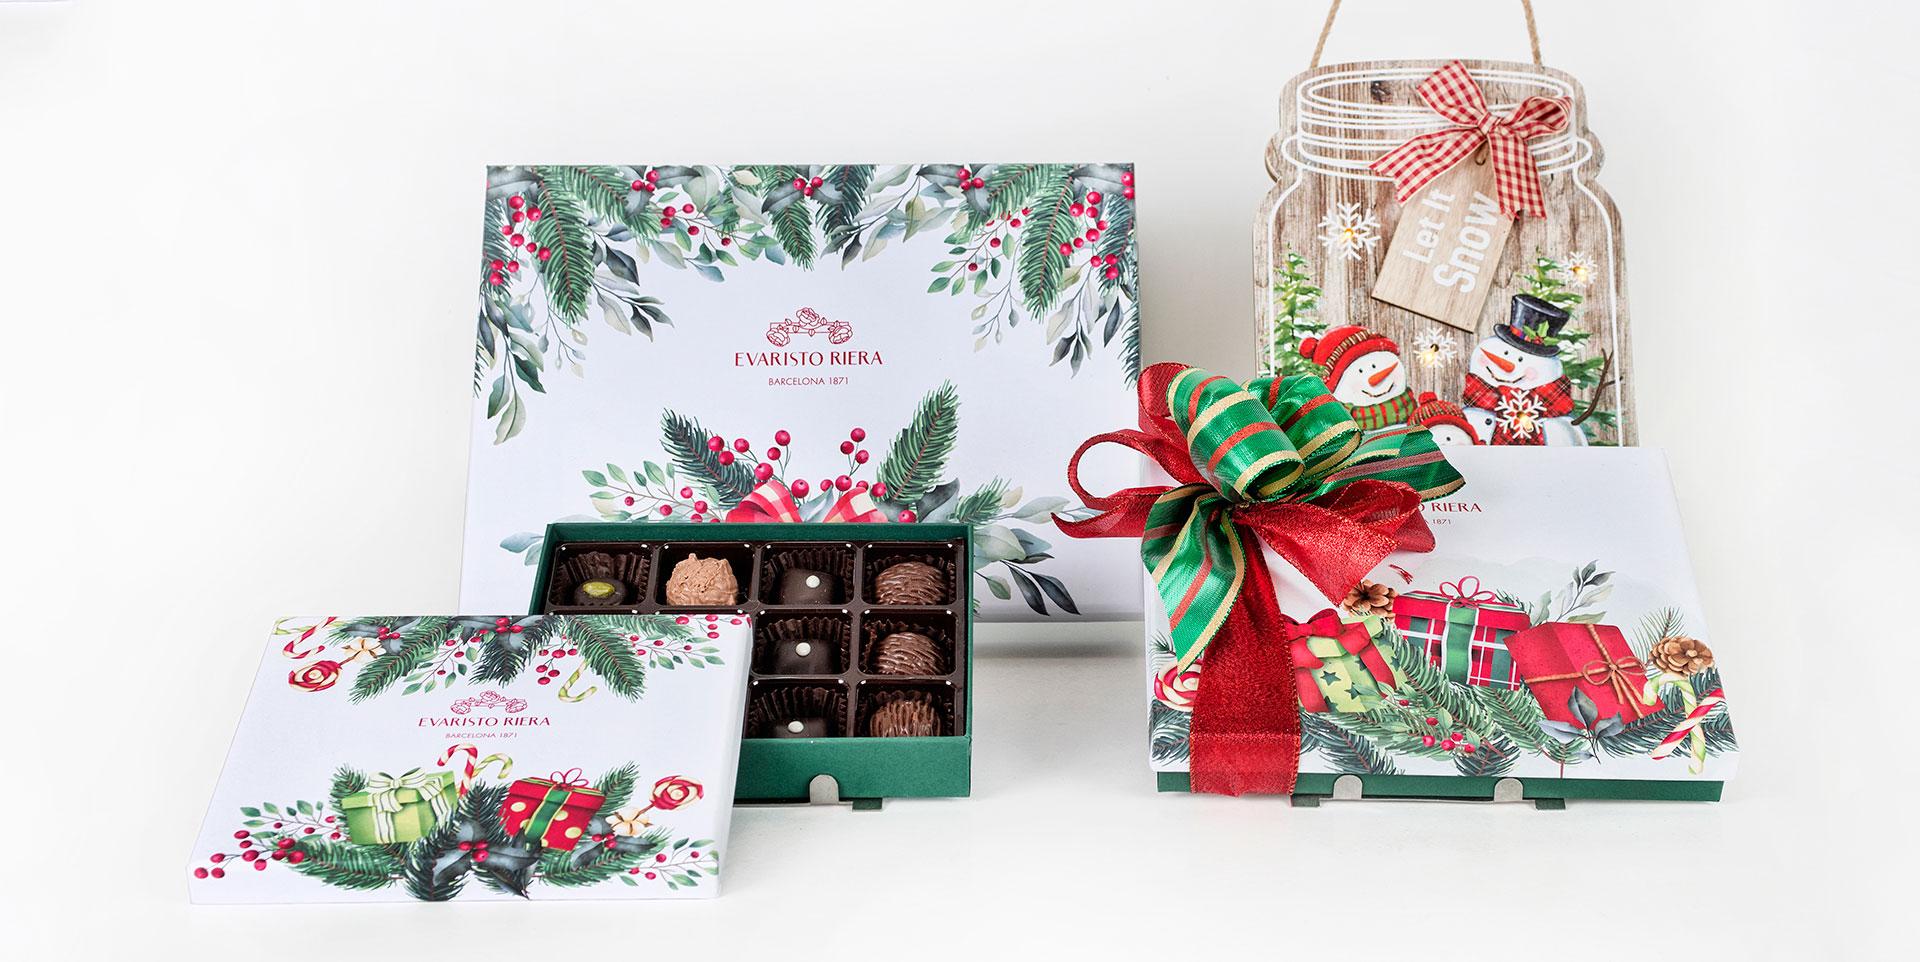 2-cajas-de-carton-para-bombones-chocolates-pasteleria-custom-pastry-boxes.jpg